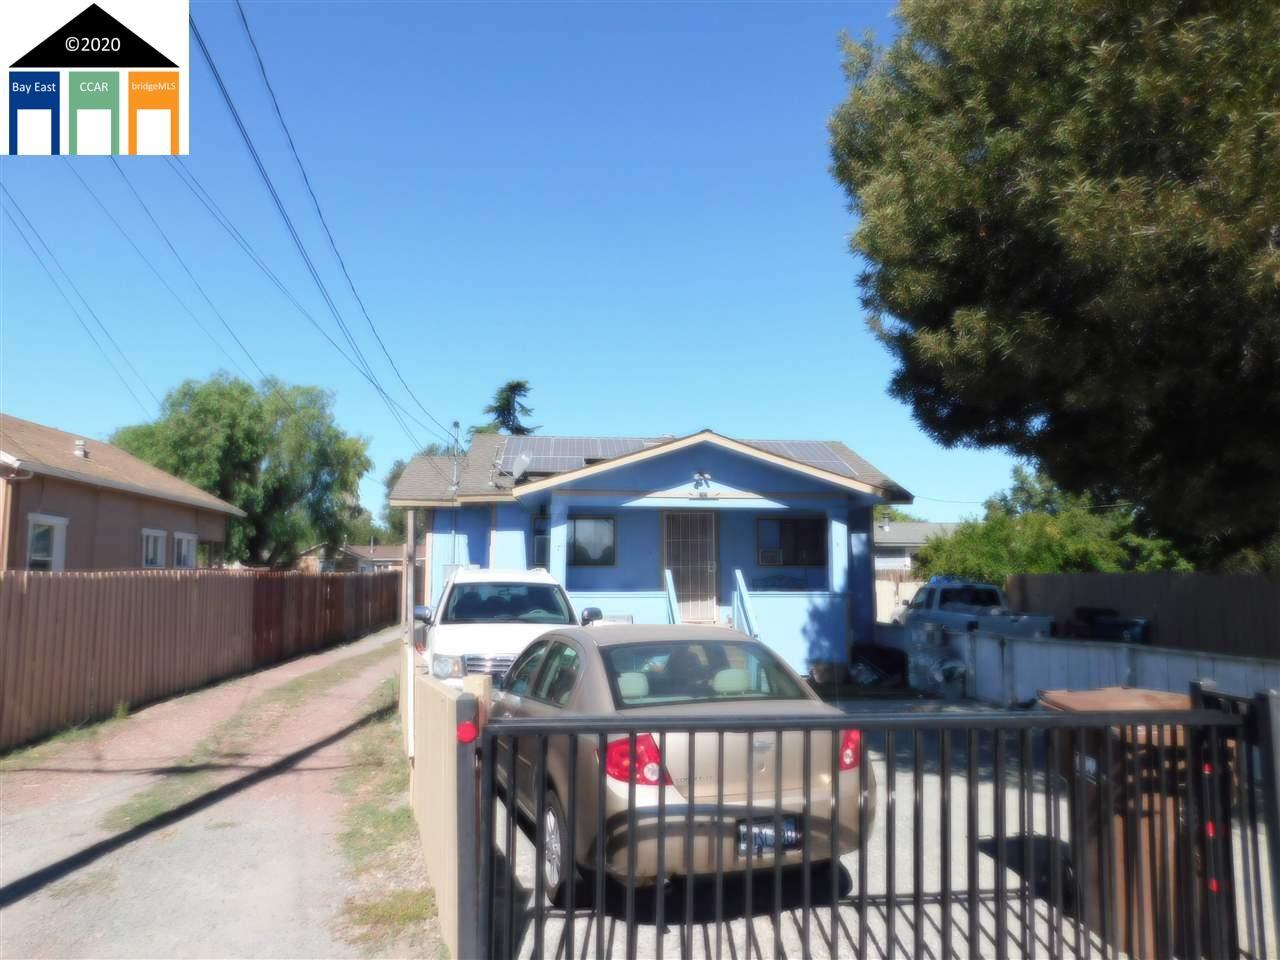 Photo of 64 Loftus Road, BAY POINT, CA 94565 (MLS # 40915247)